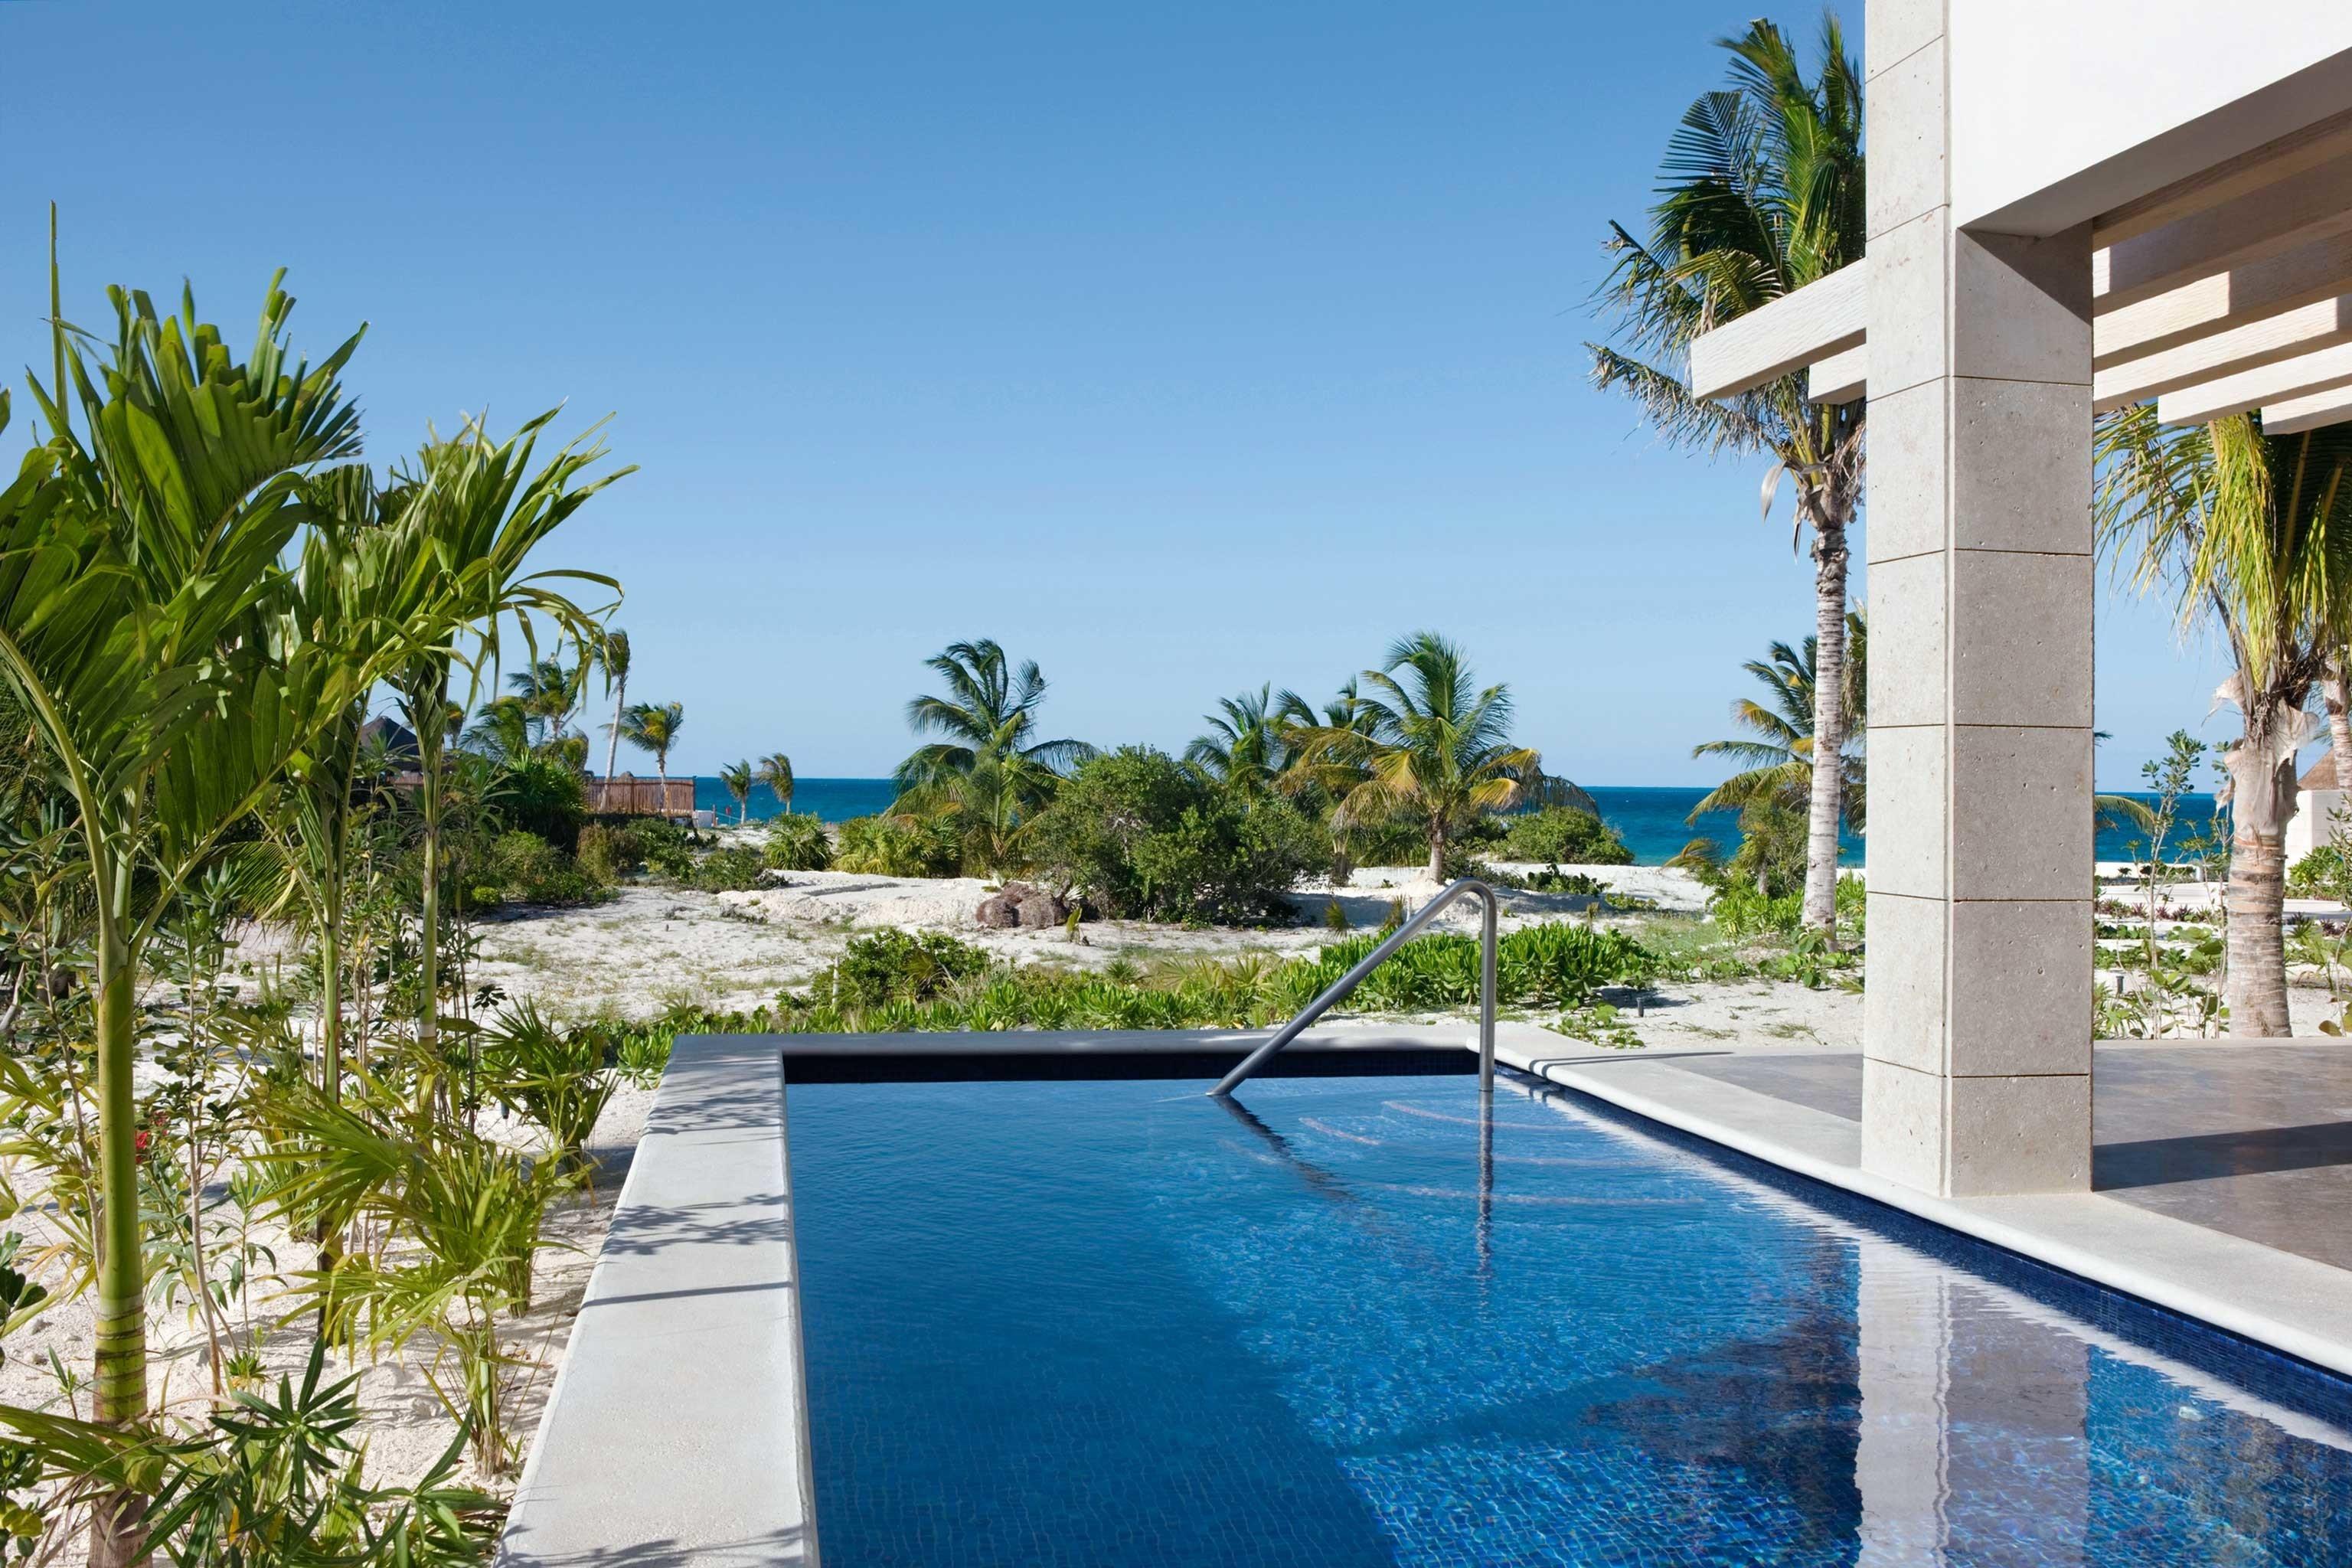 Luxury Modern Pool Tropical tree sky swimming pool property leisure Resort Villa condominium home backyard mansion